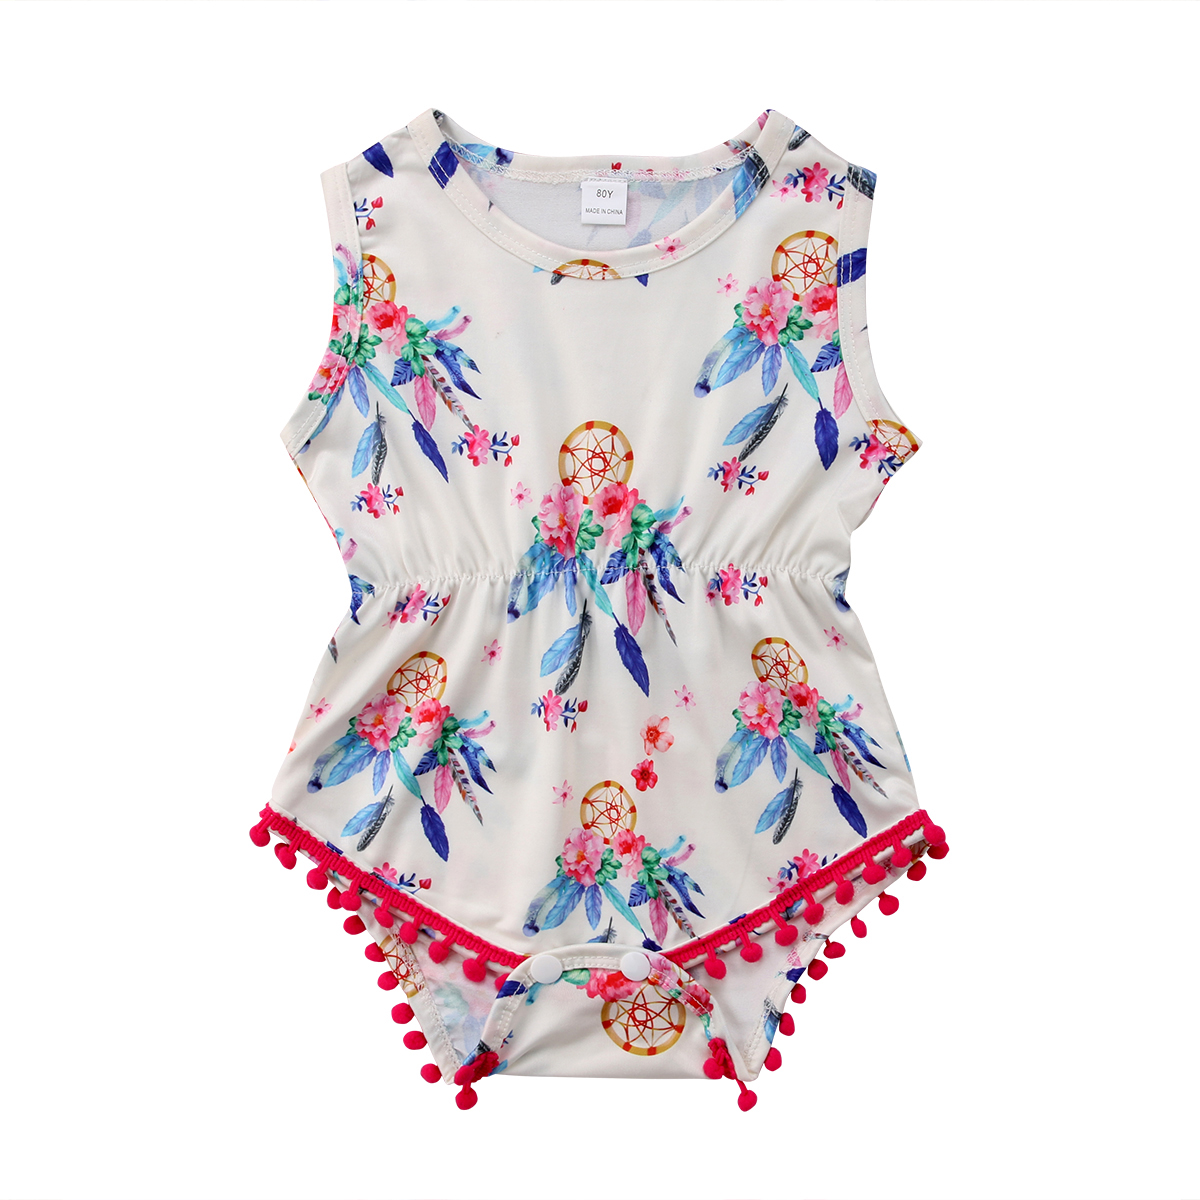 4d753096e68 Pretty Tassel   Floral Romper Newborn Baby Girl Jumpsuit Playsuit Summer  Clothes